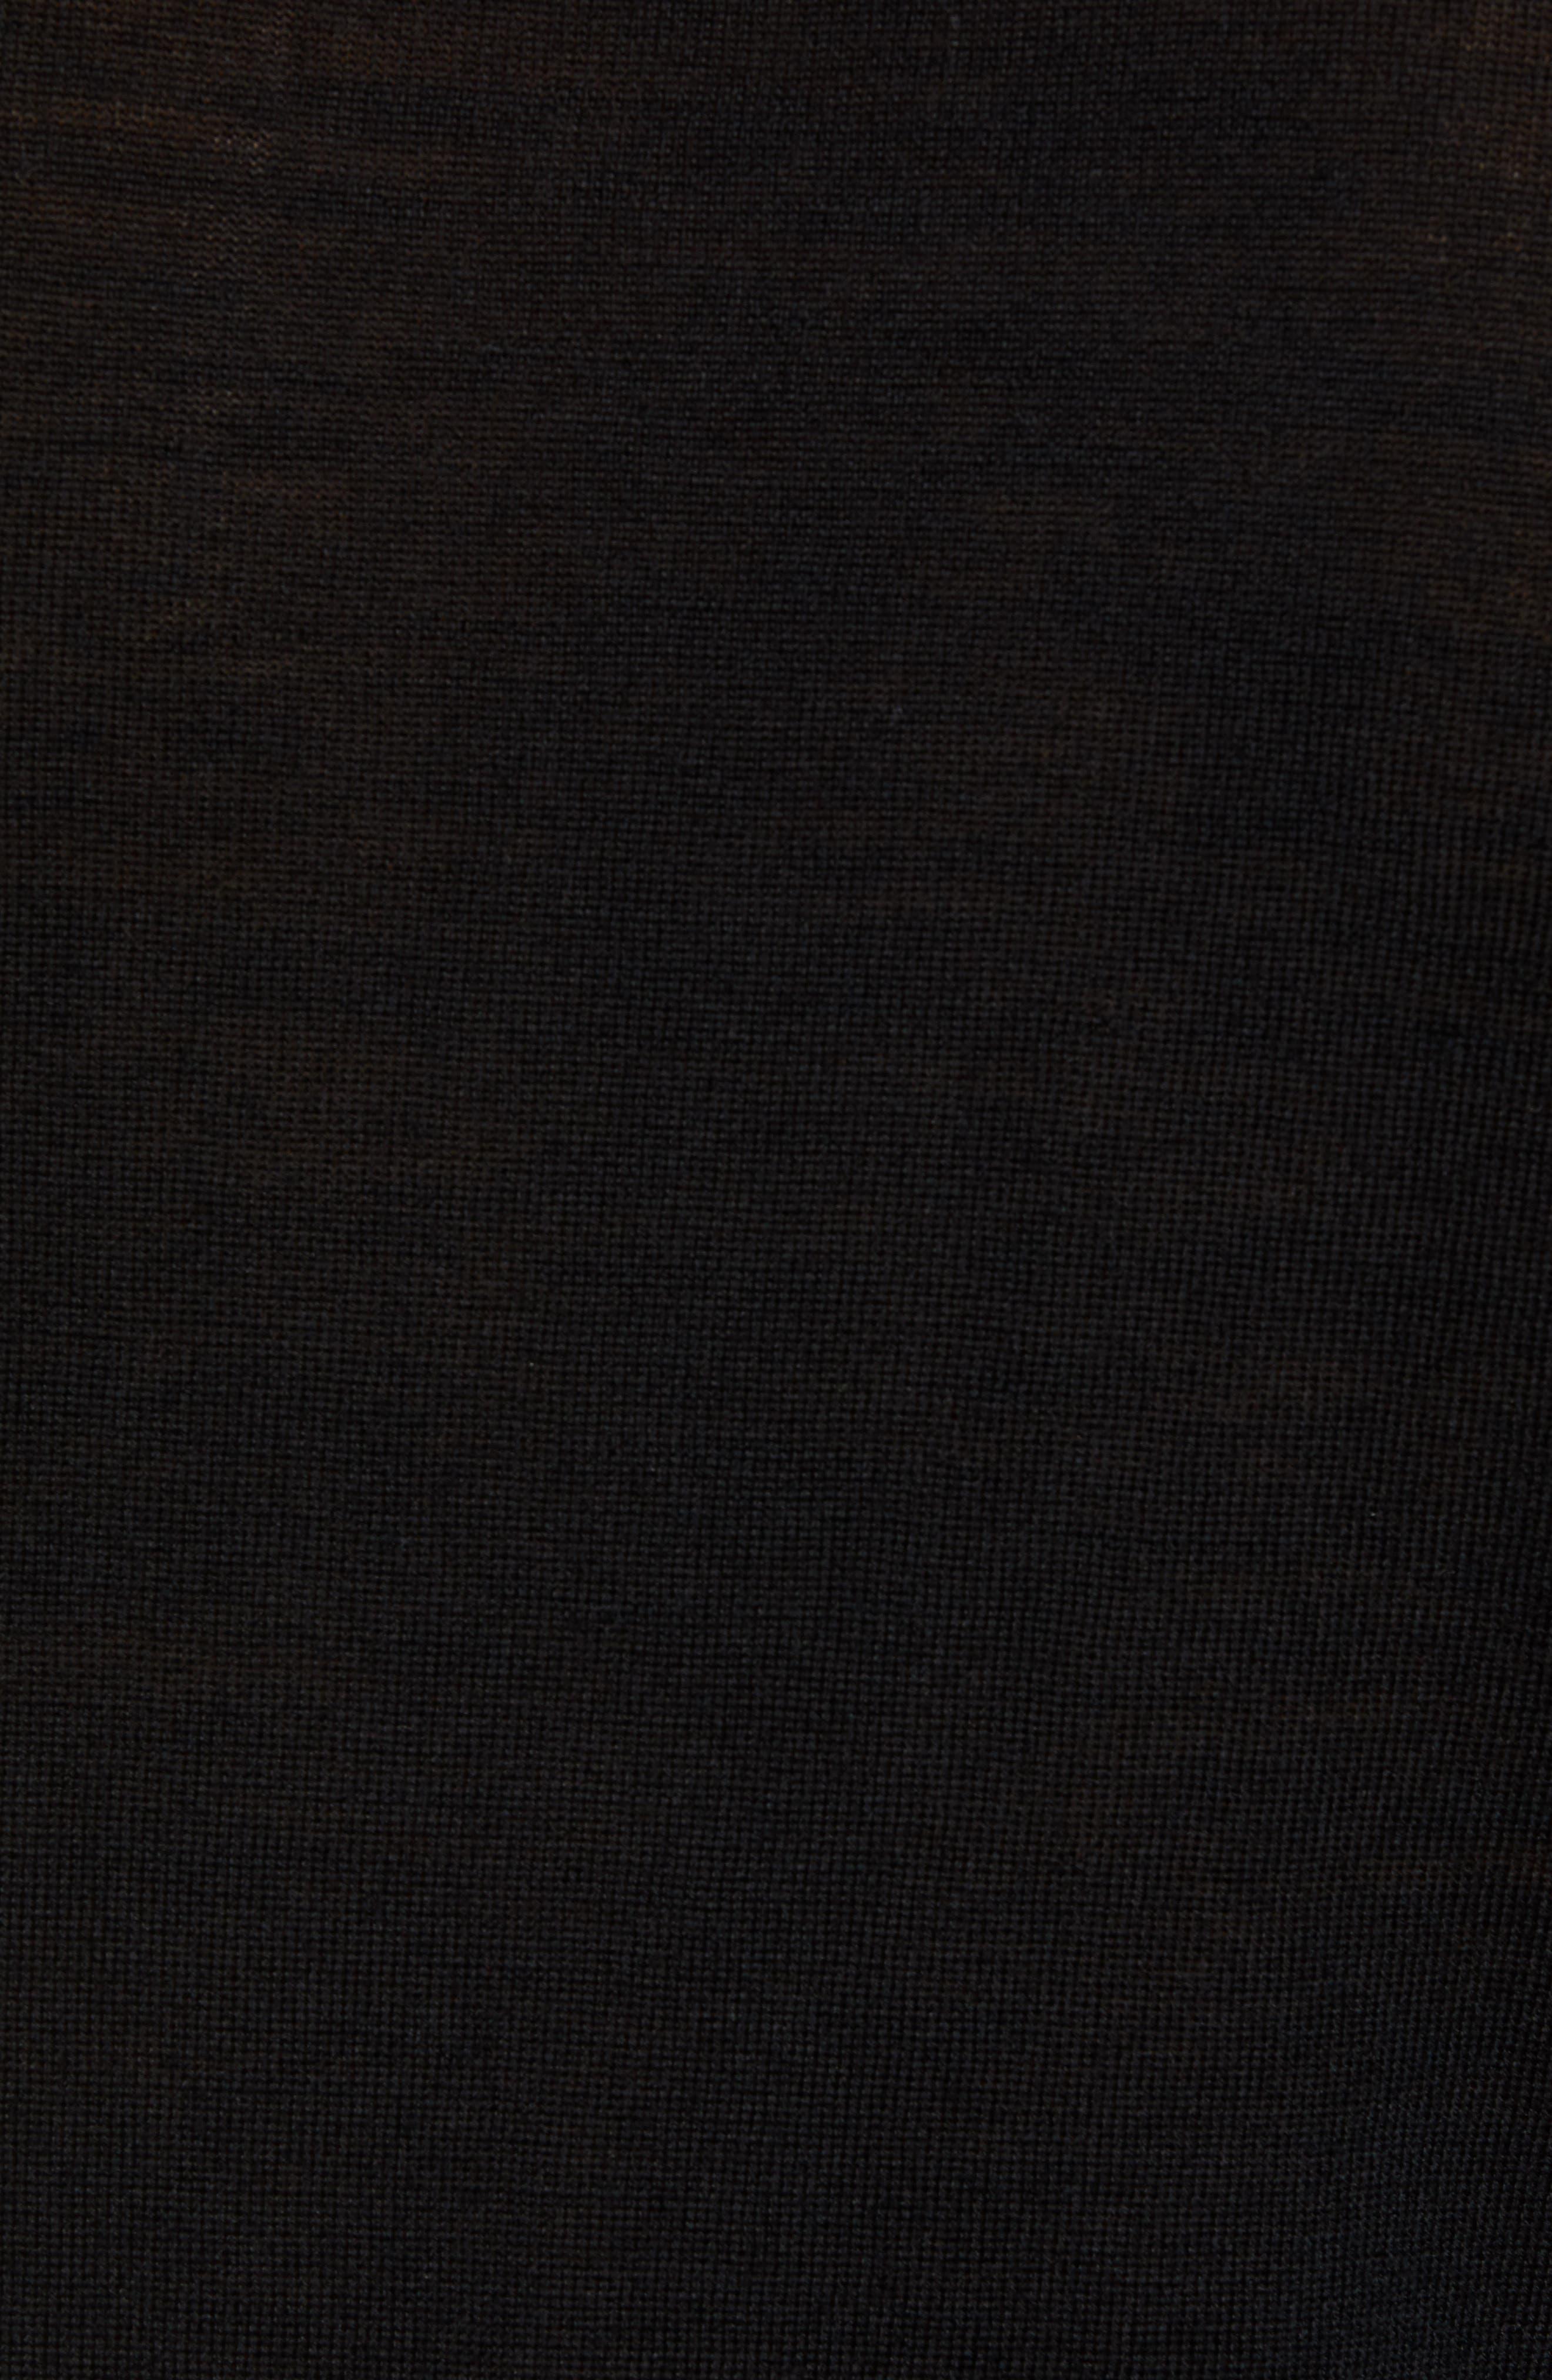 Mode Slim Fit Merino Wool Sweater,                             Alternate thumbnail 5, color,                             Black